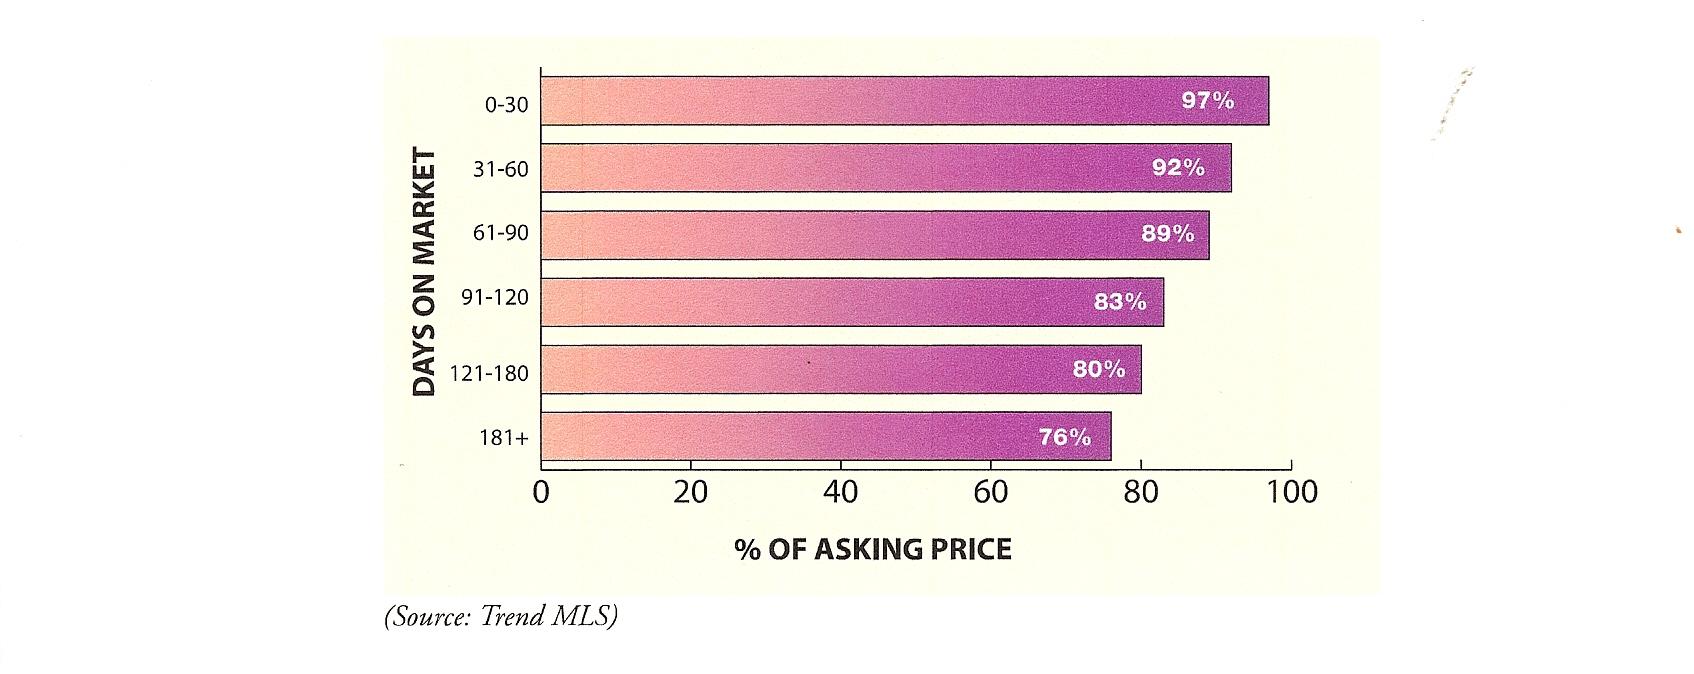 Days on Market vs. % of Asking Price